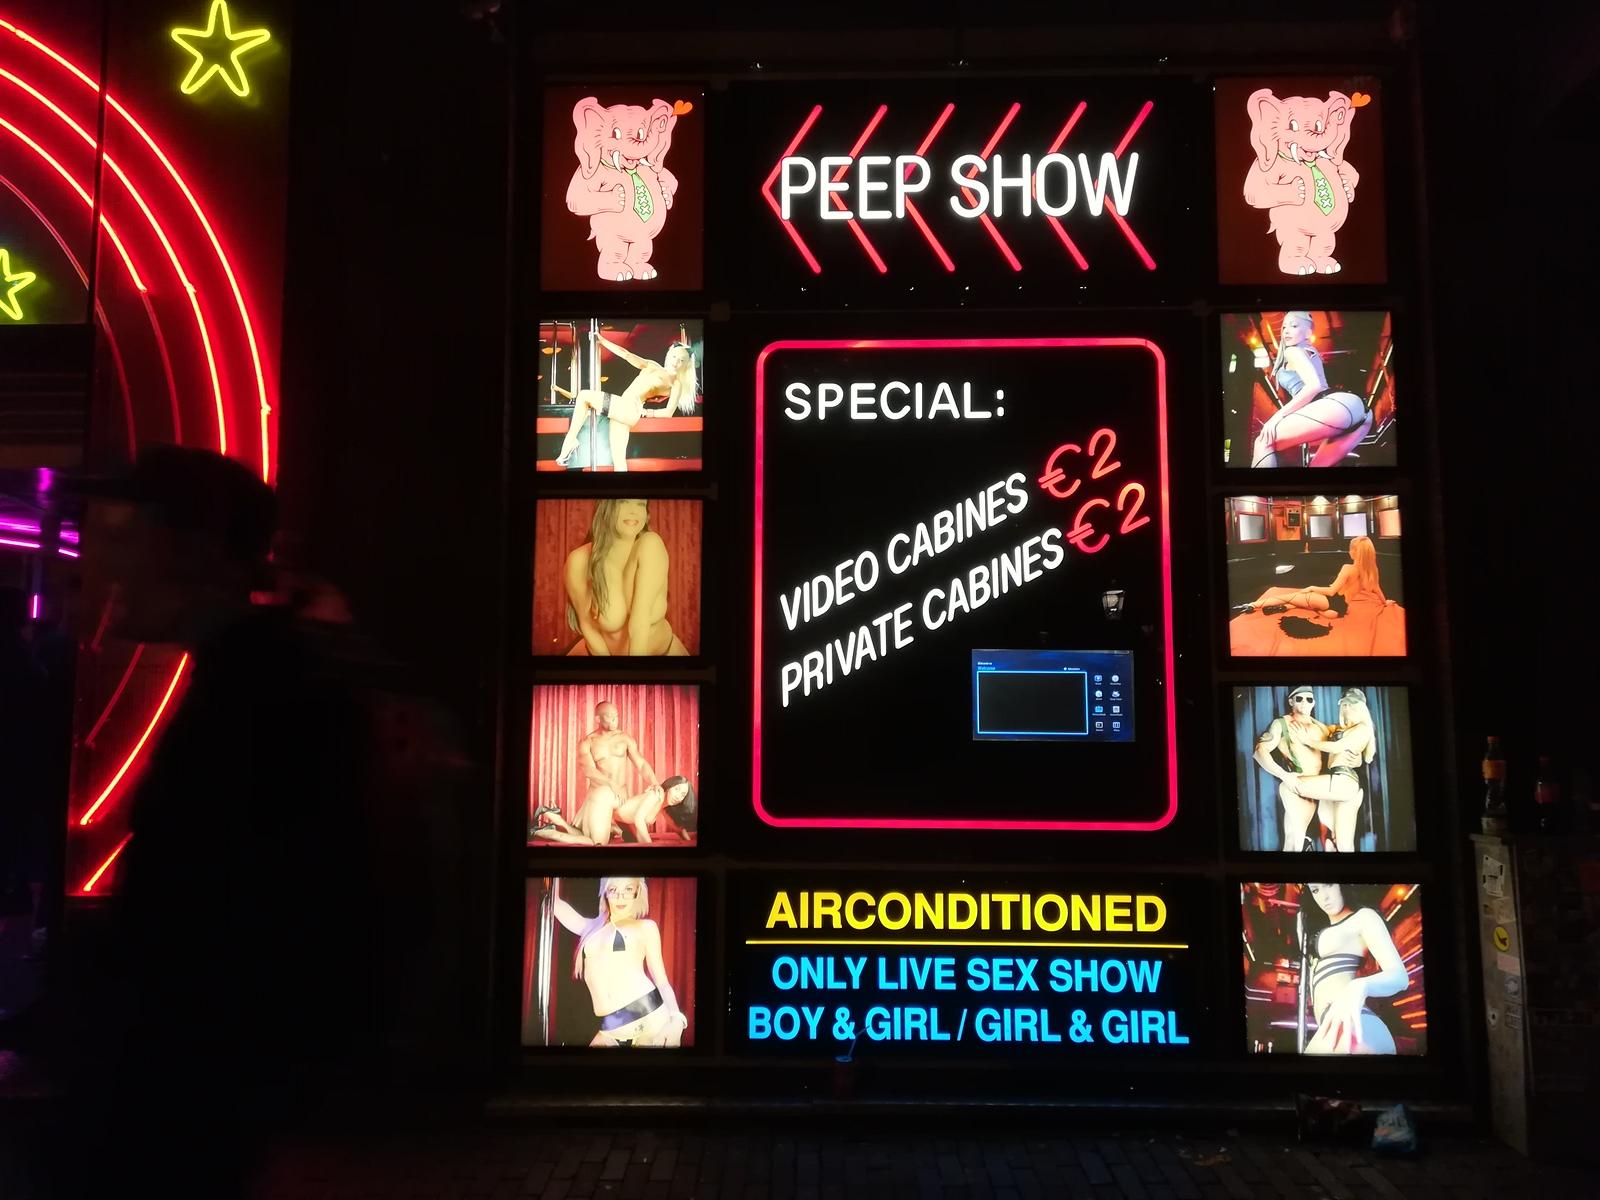 amsterdam red light district peep show